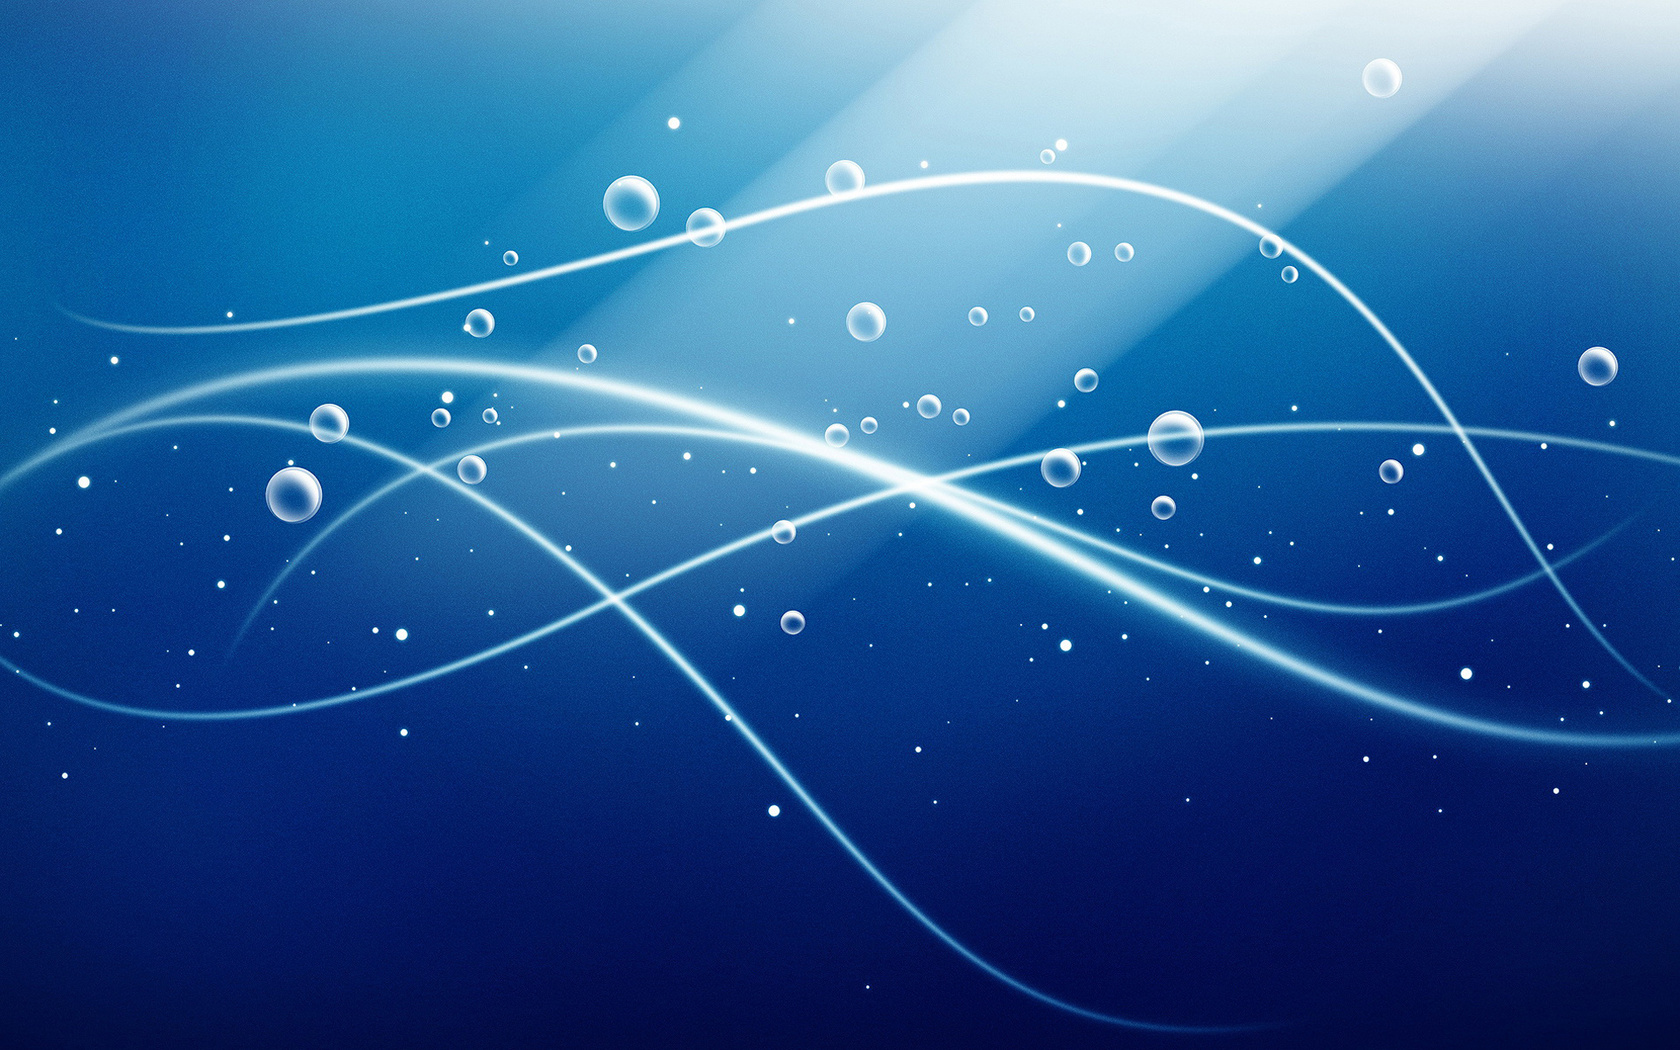 лучи, линии, Абстракция, пузыри, круги